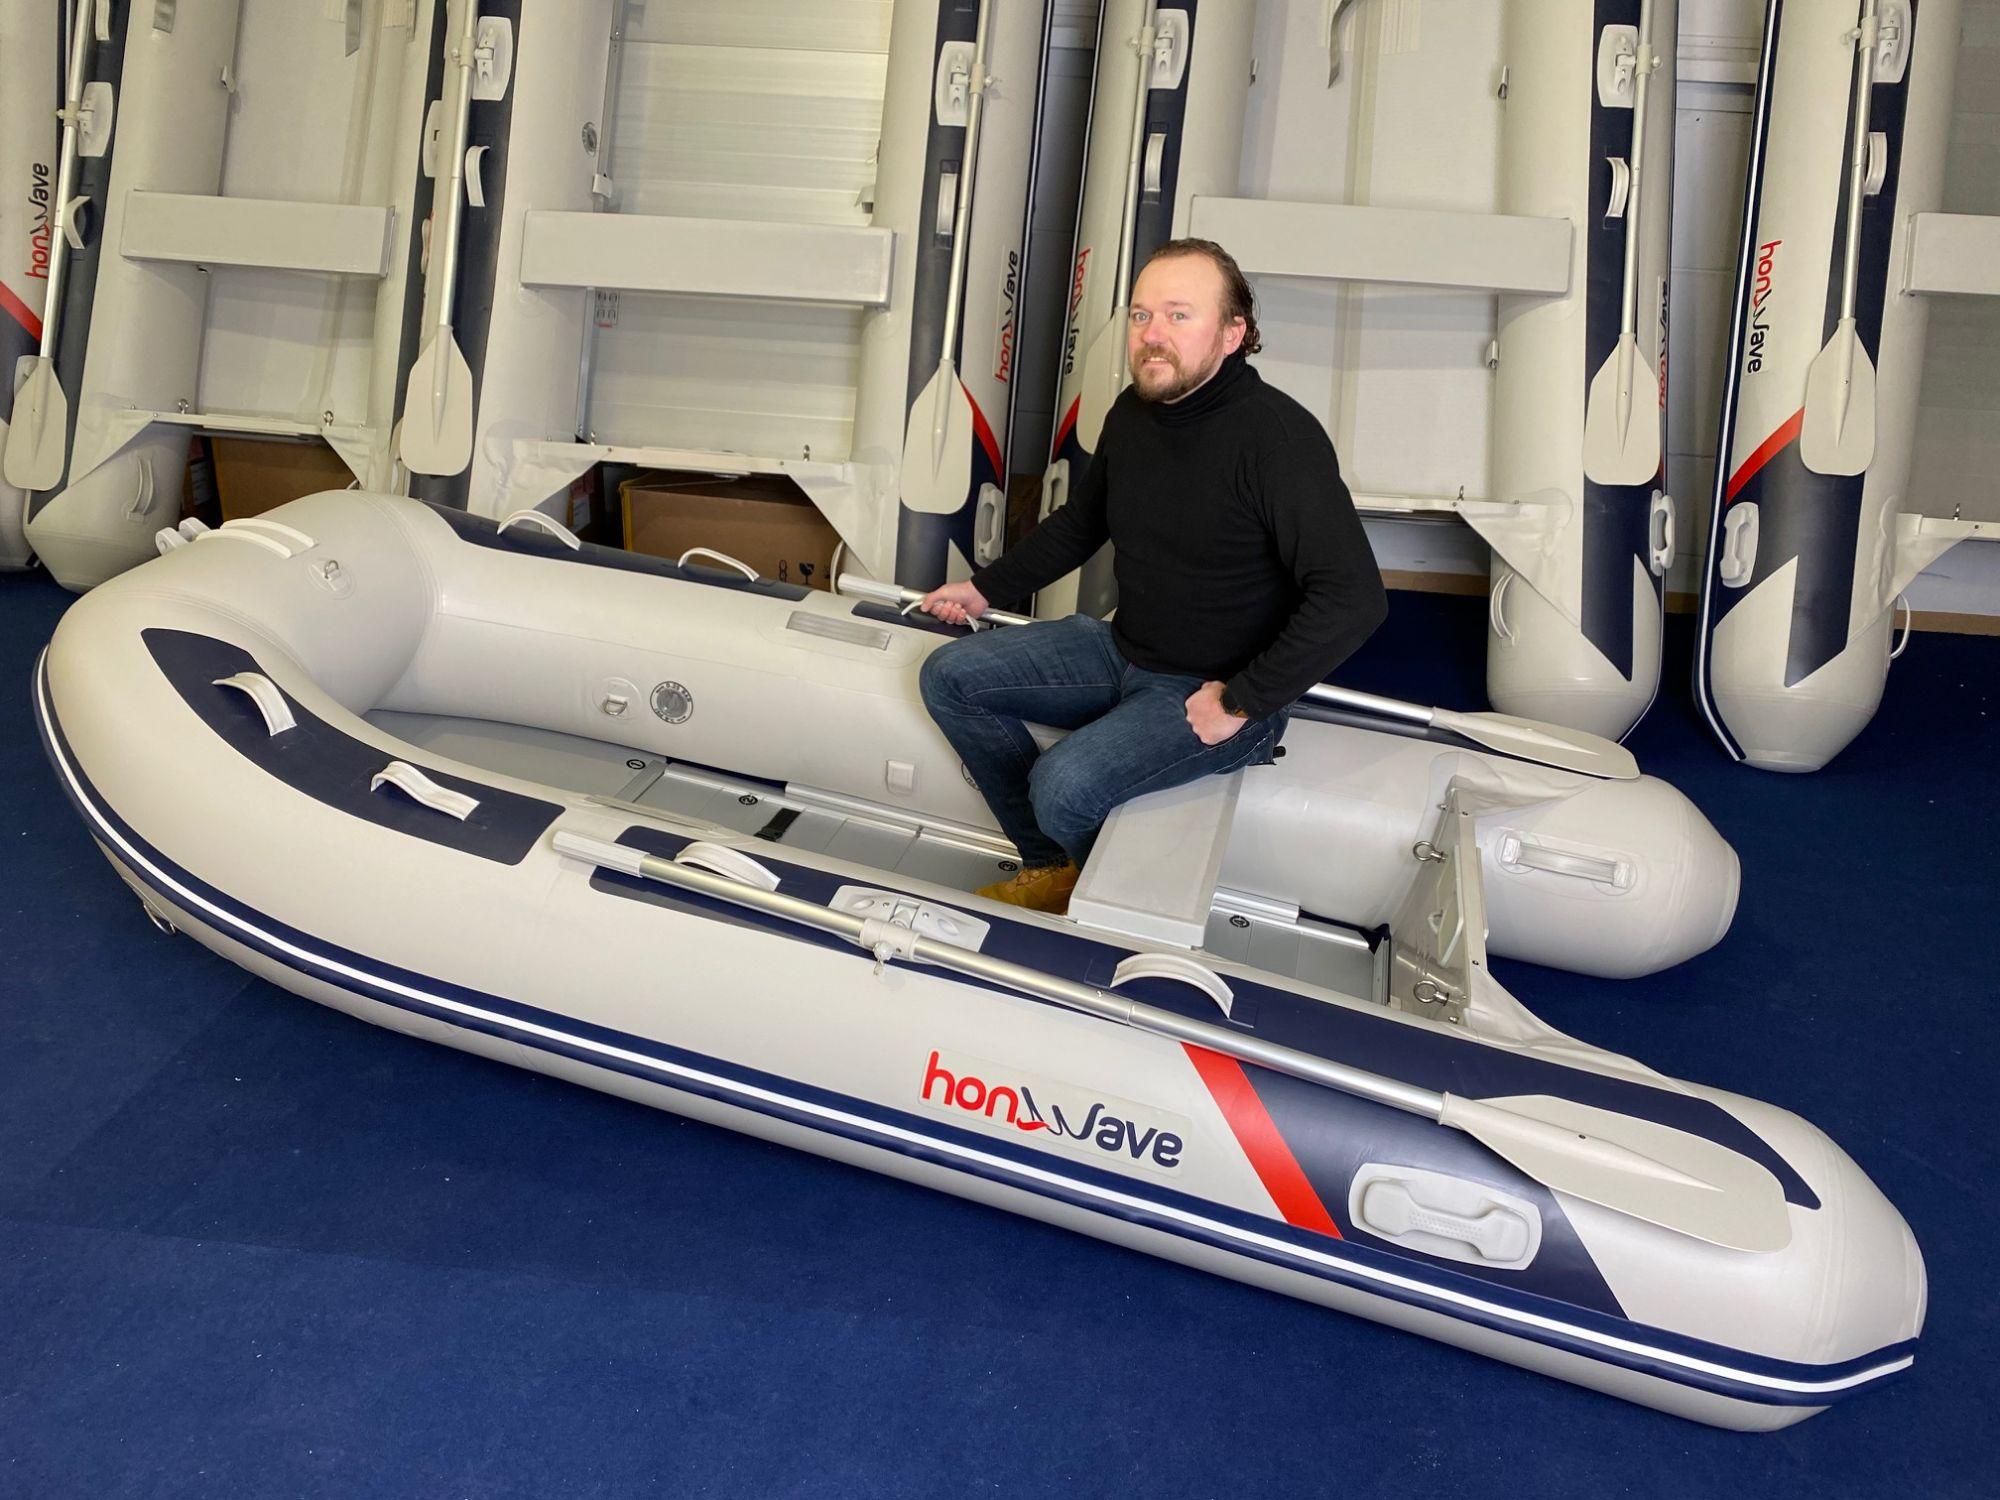 Honda Honwave T30 AE3 Schlauchboot Alu-Boden Mod.2021